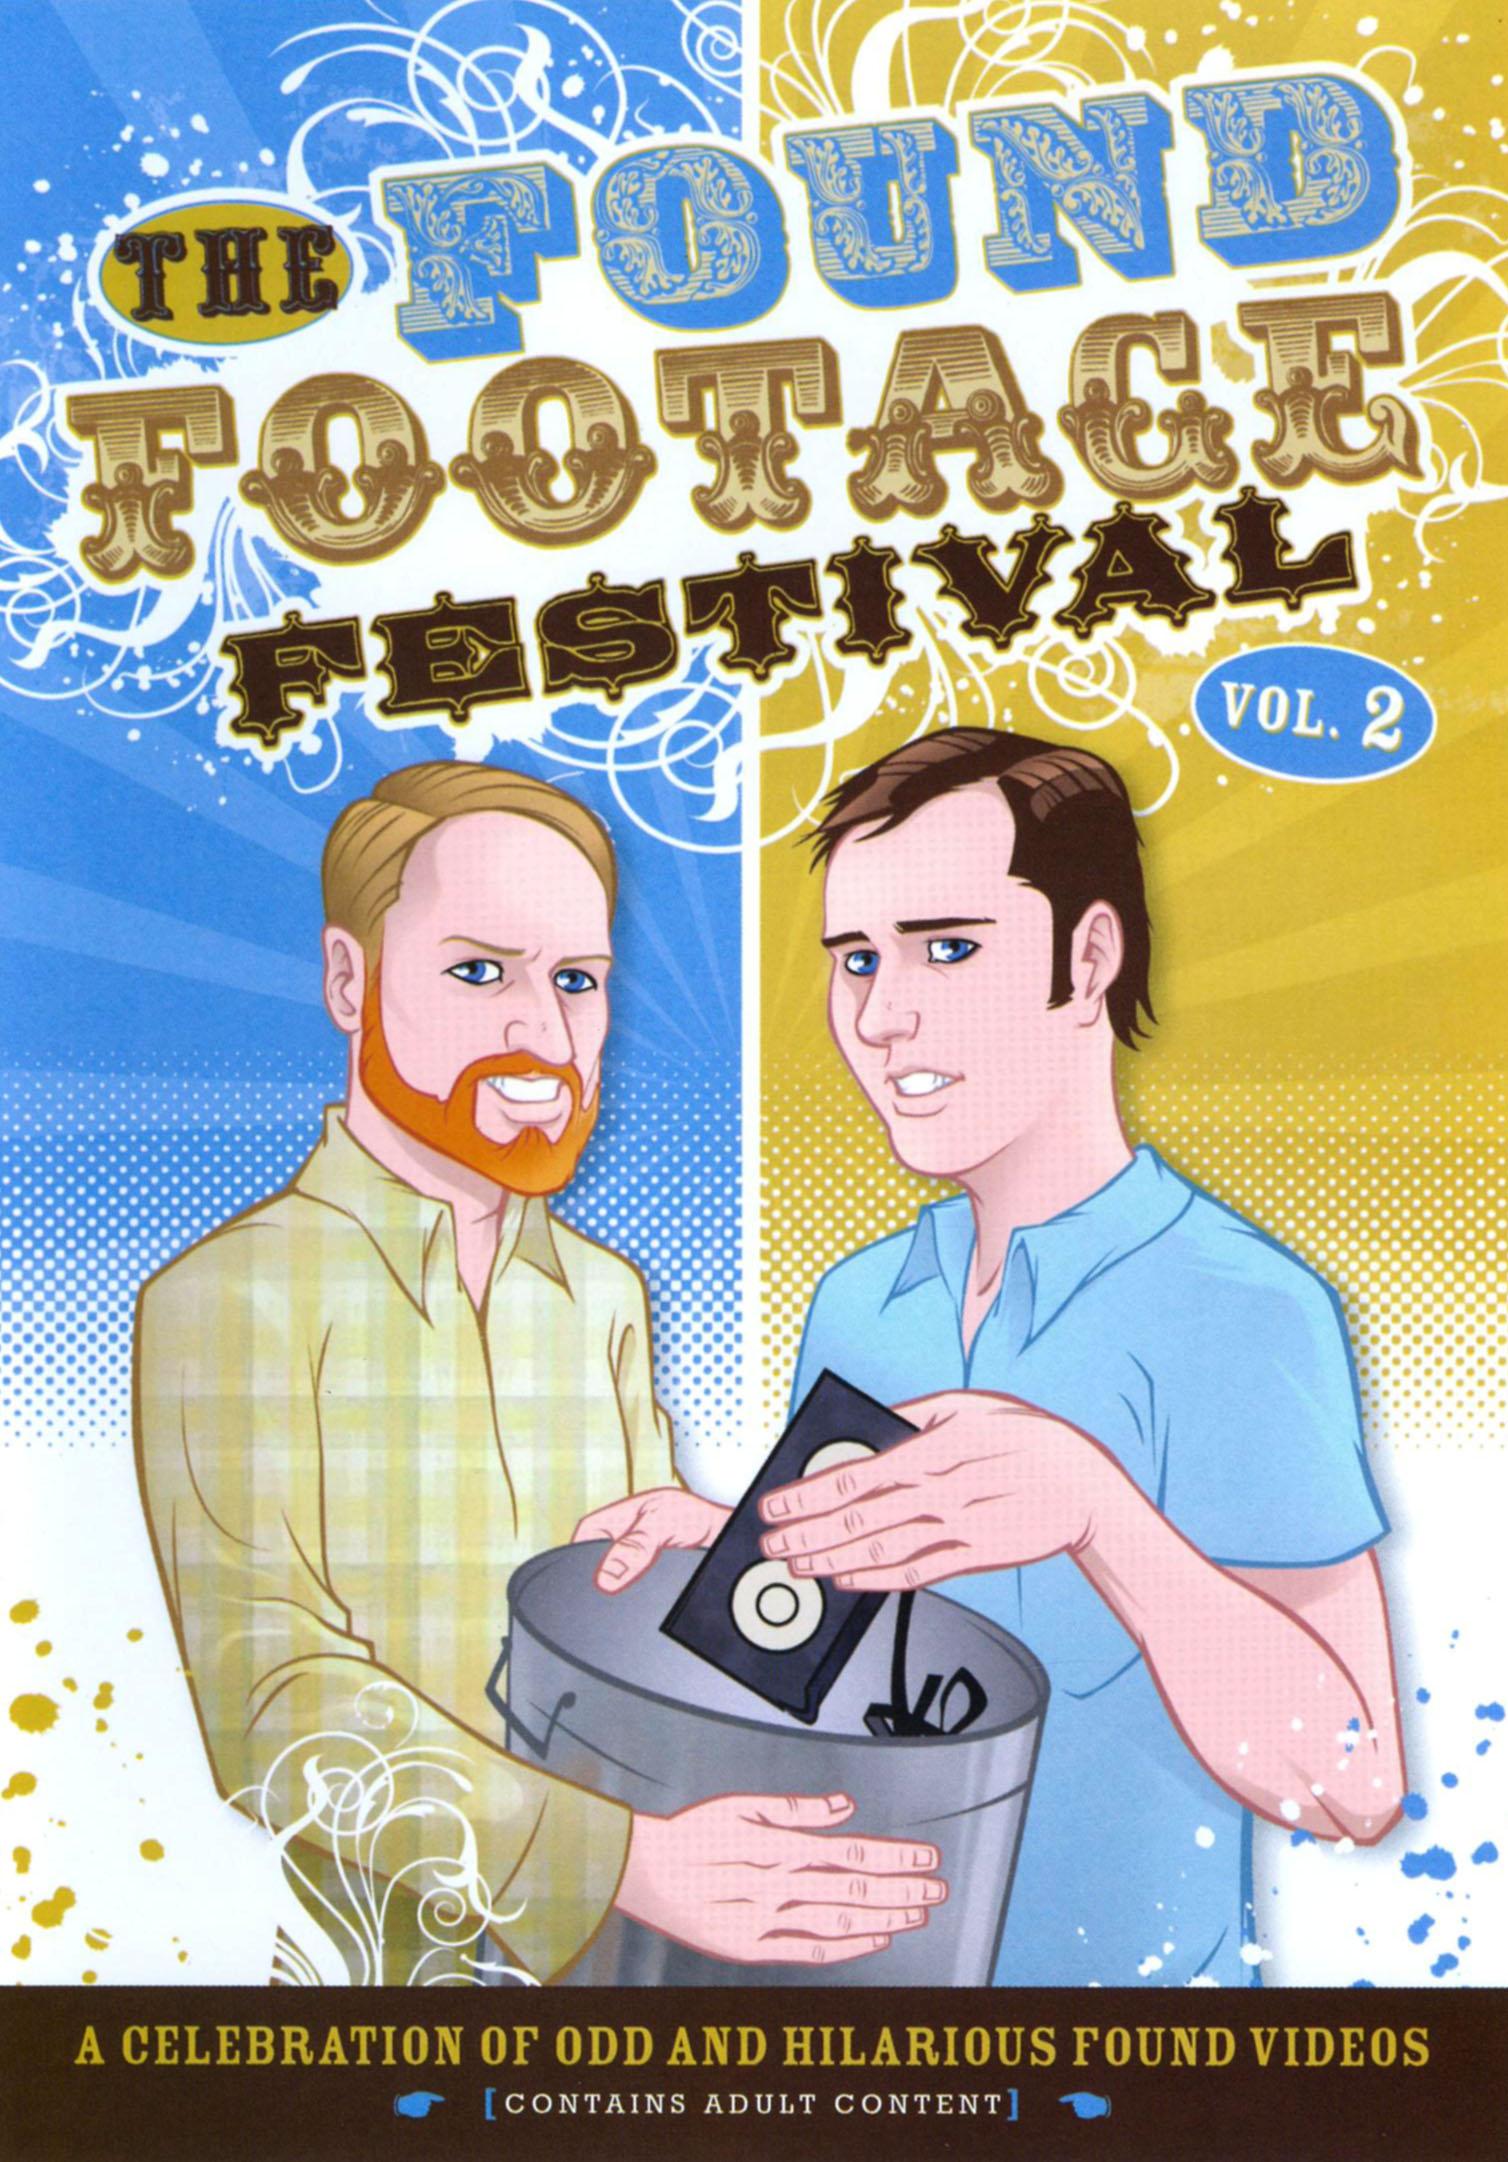 The Found Footage Festival, Vol. 2